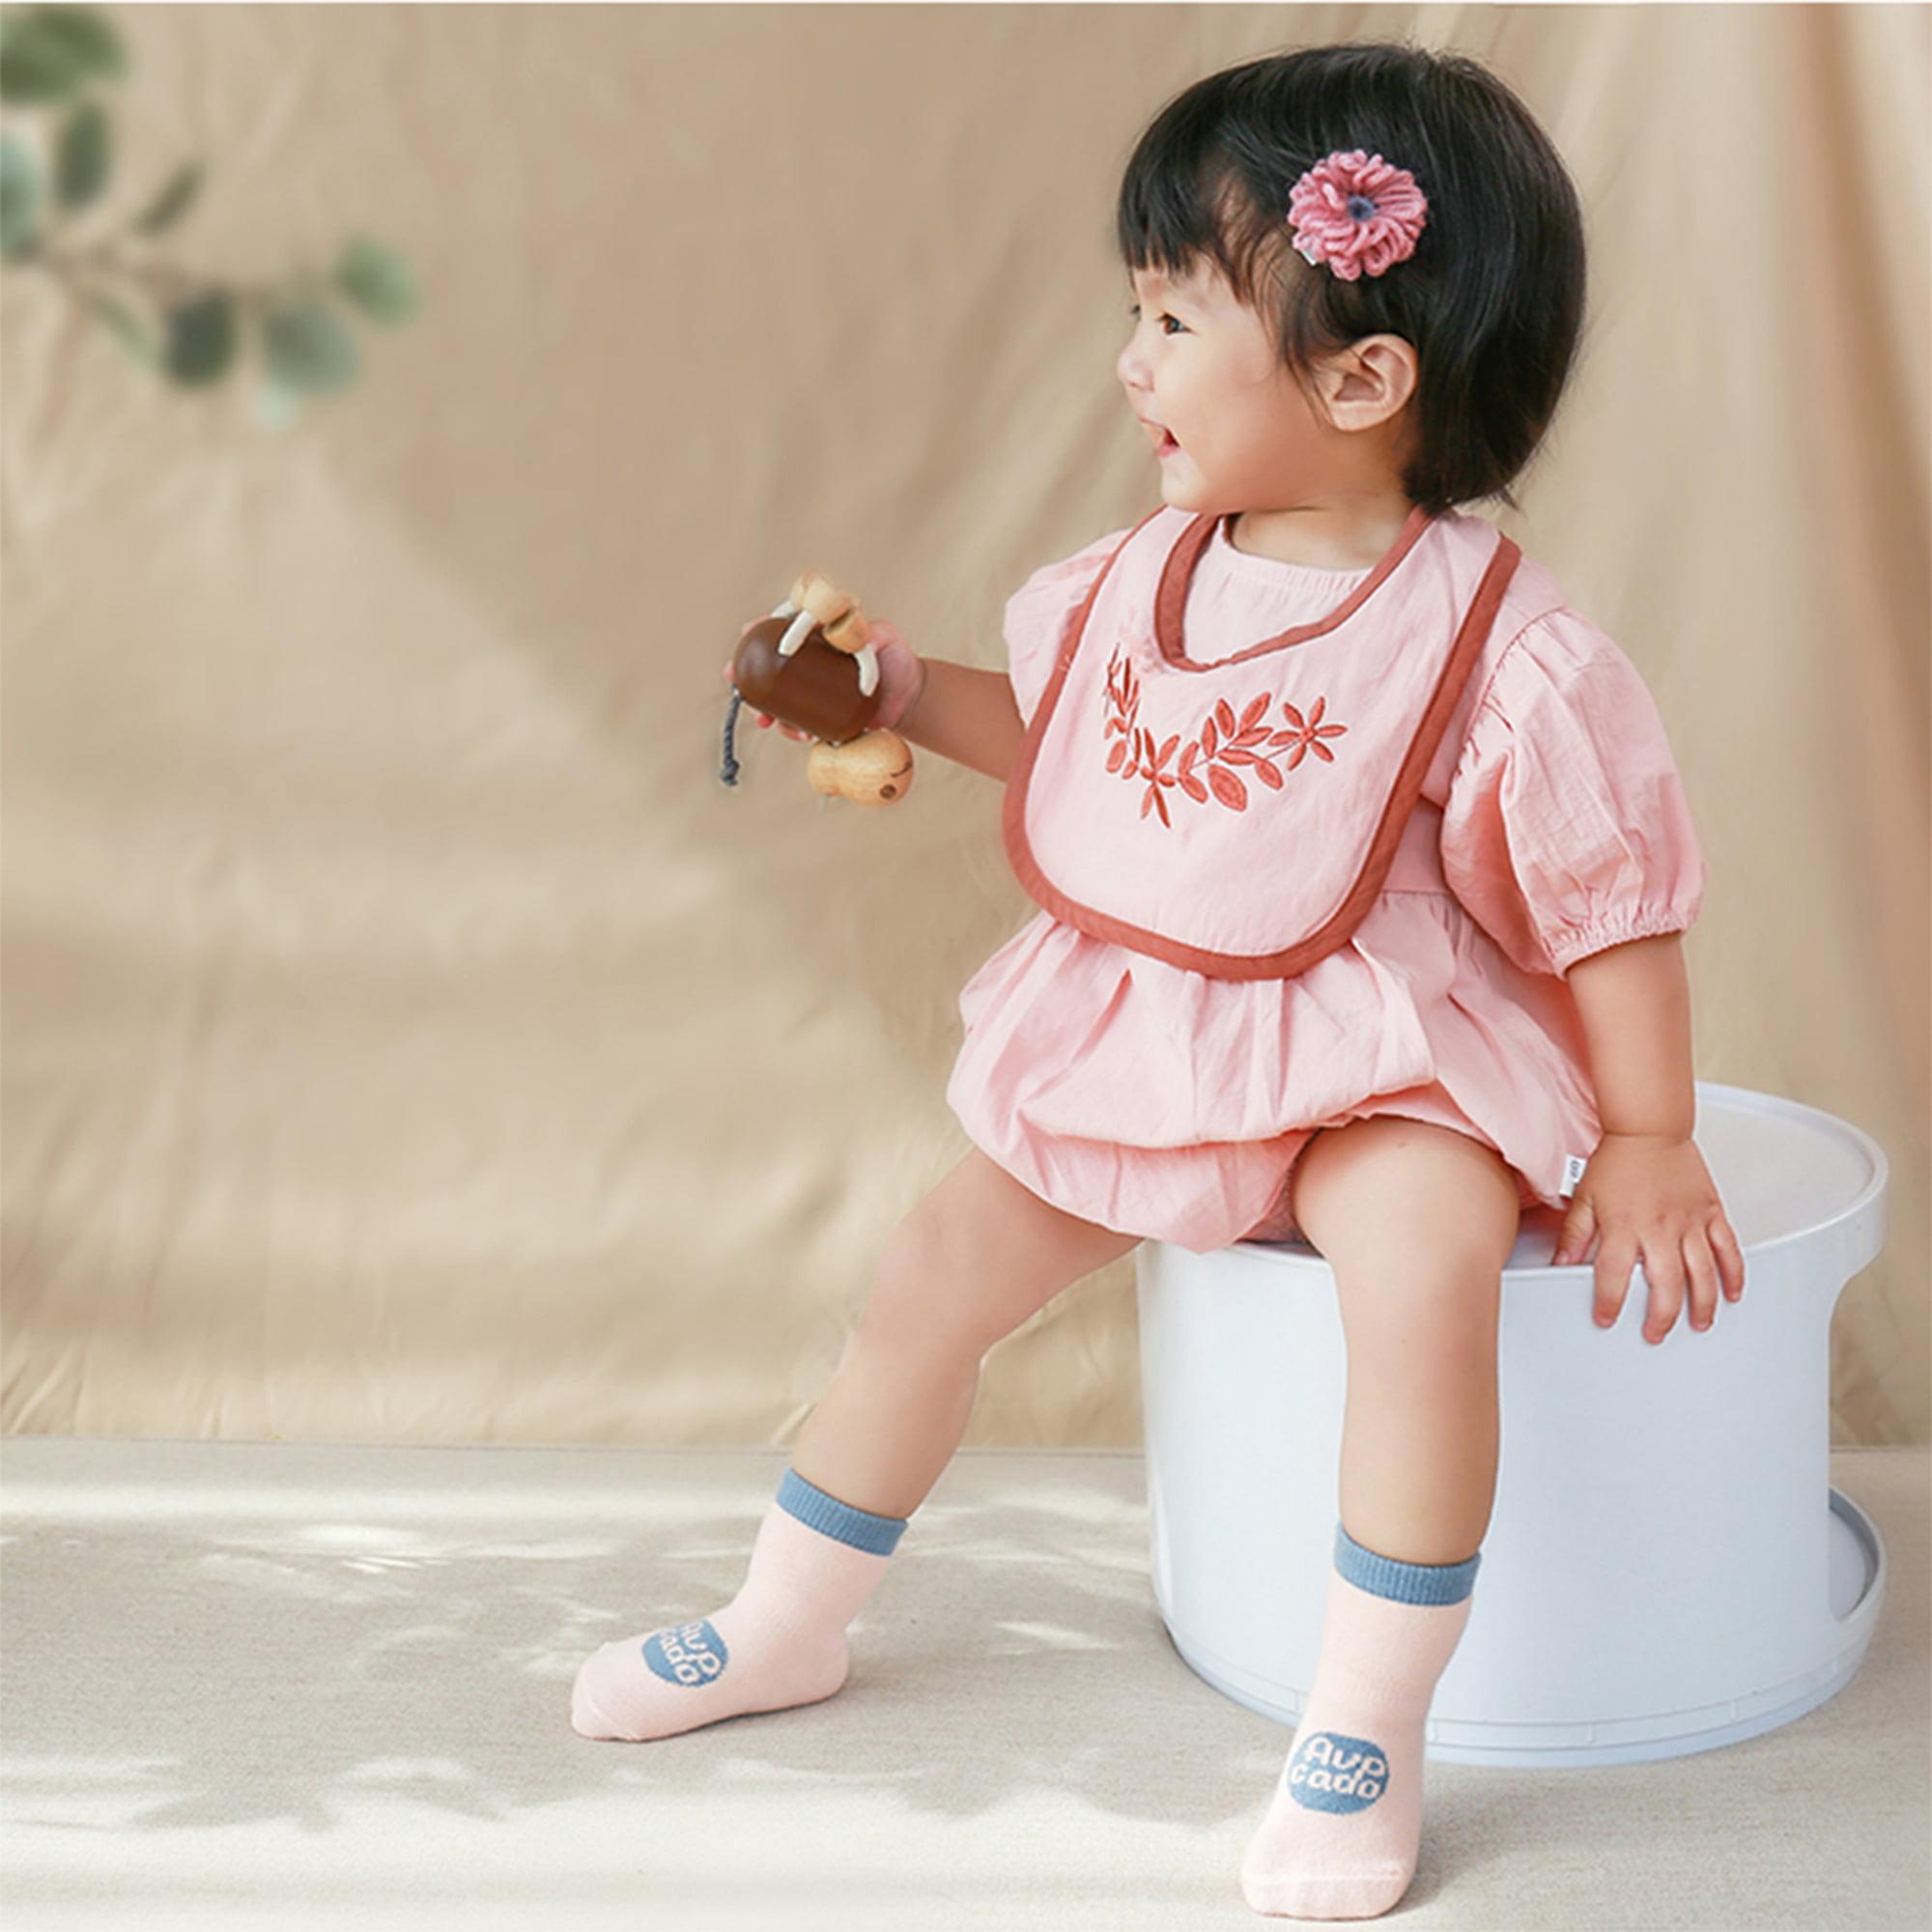 6Pair Anti-slip Baby Socks Boys Girls Kids Grey Cotton Ankle Sock Size 0-5 Years